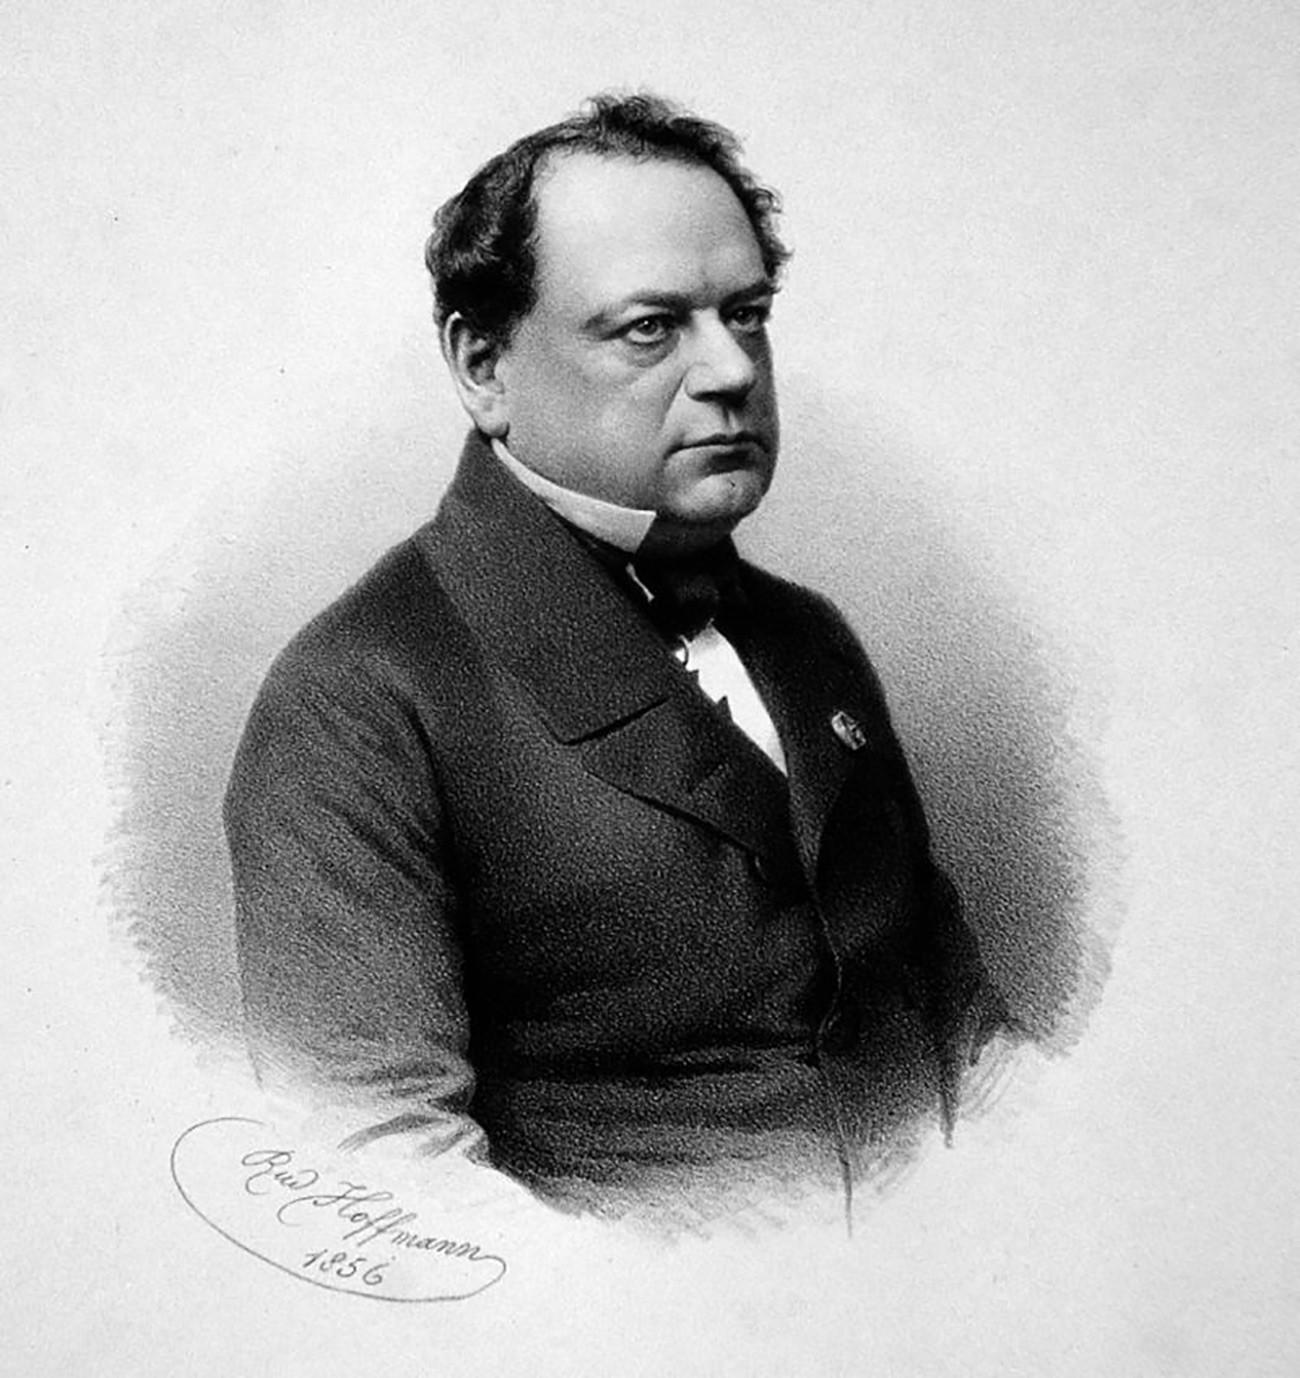 Portret Moritza Hermanna von Jacobija